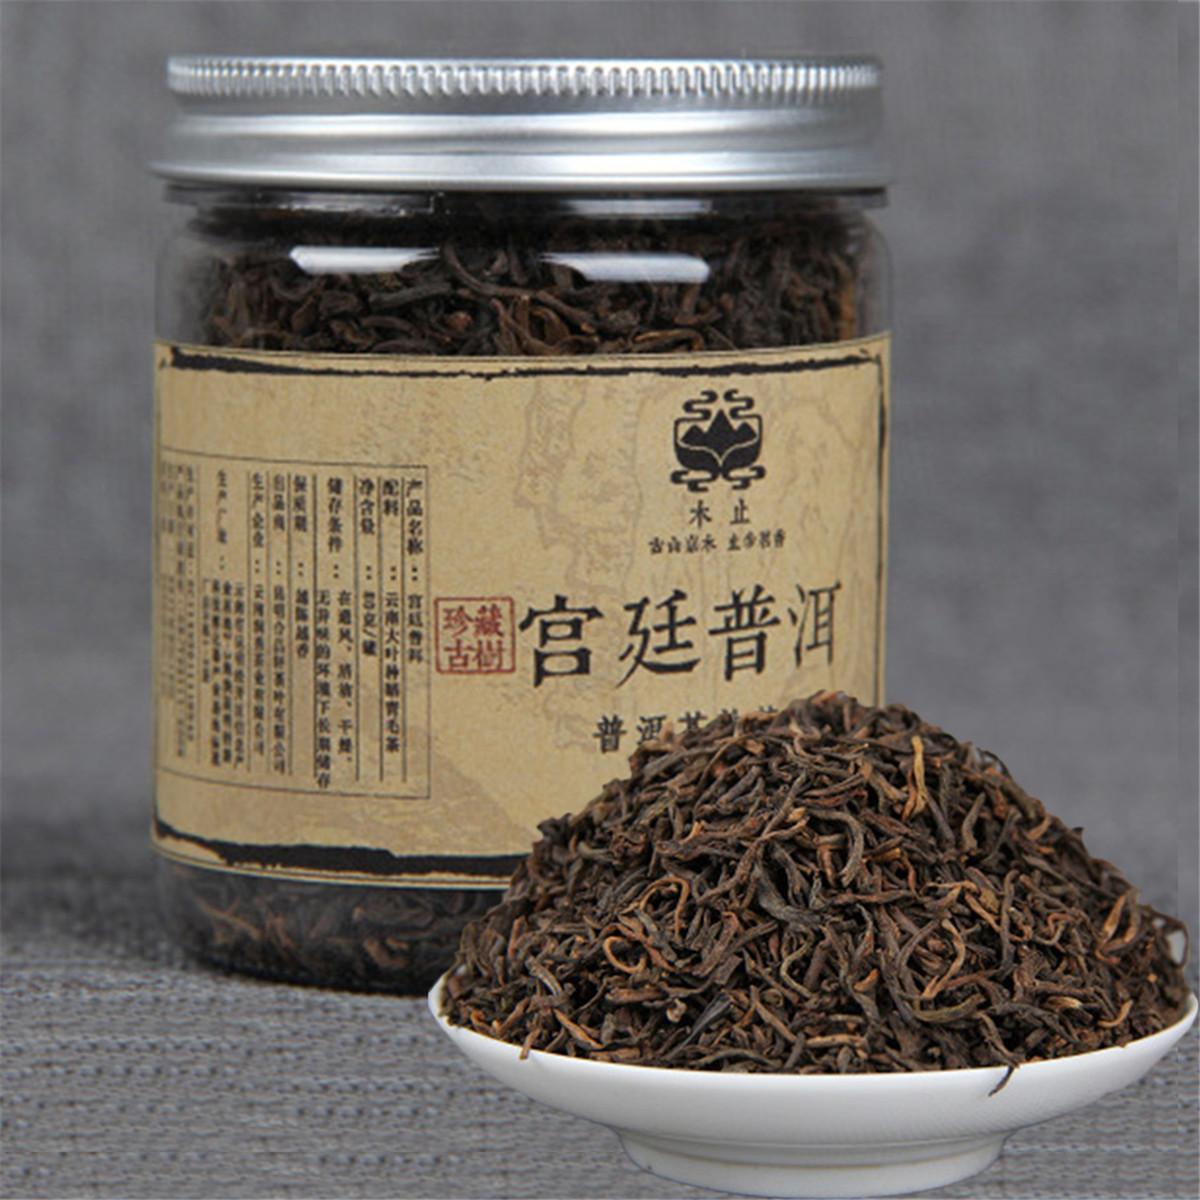 Yunnan Puerh Tee Kleine Dosen Palast reife PU-äh Schwarzer Tee 80g organische Puer chinesischer Puer Pu Erh Grüne Lebensmittel Puerh Red Tee